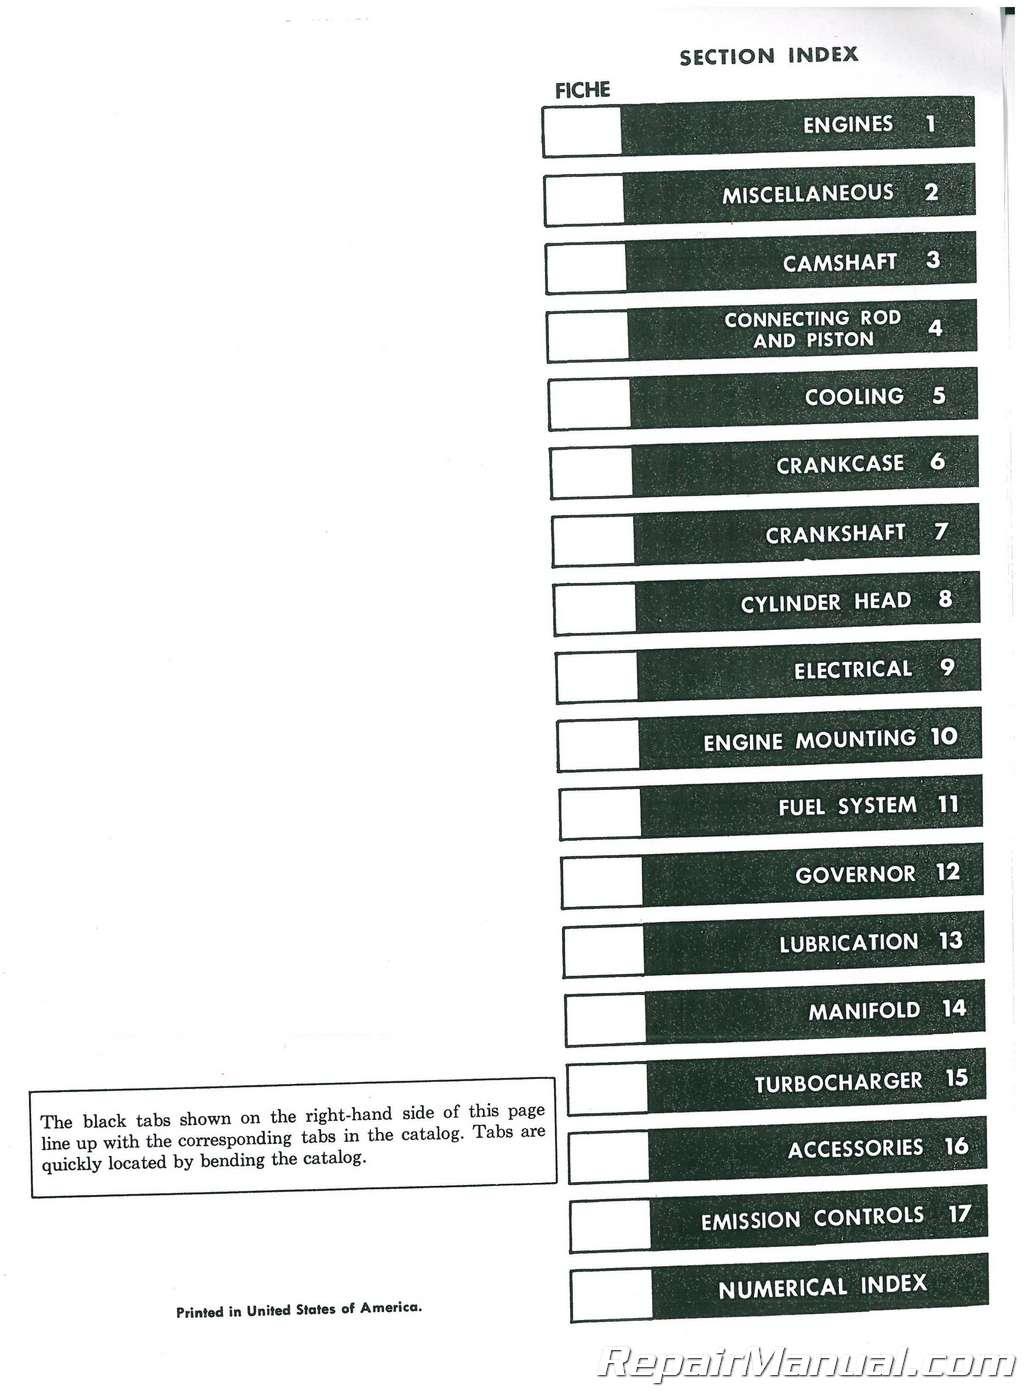 International Engine Parts Diagram Wiring Library Navistar Dt466 Harvester D817 Series C Manual